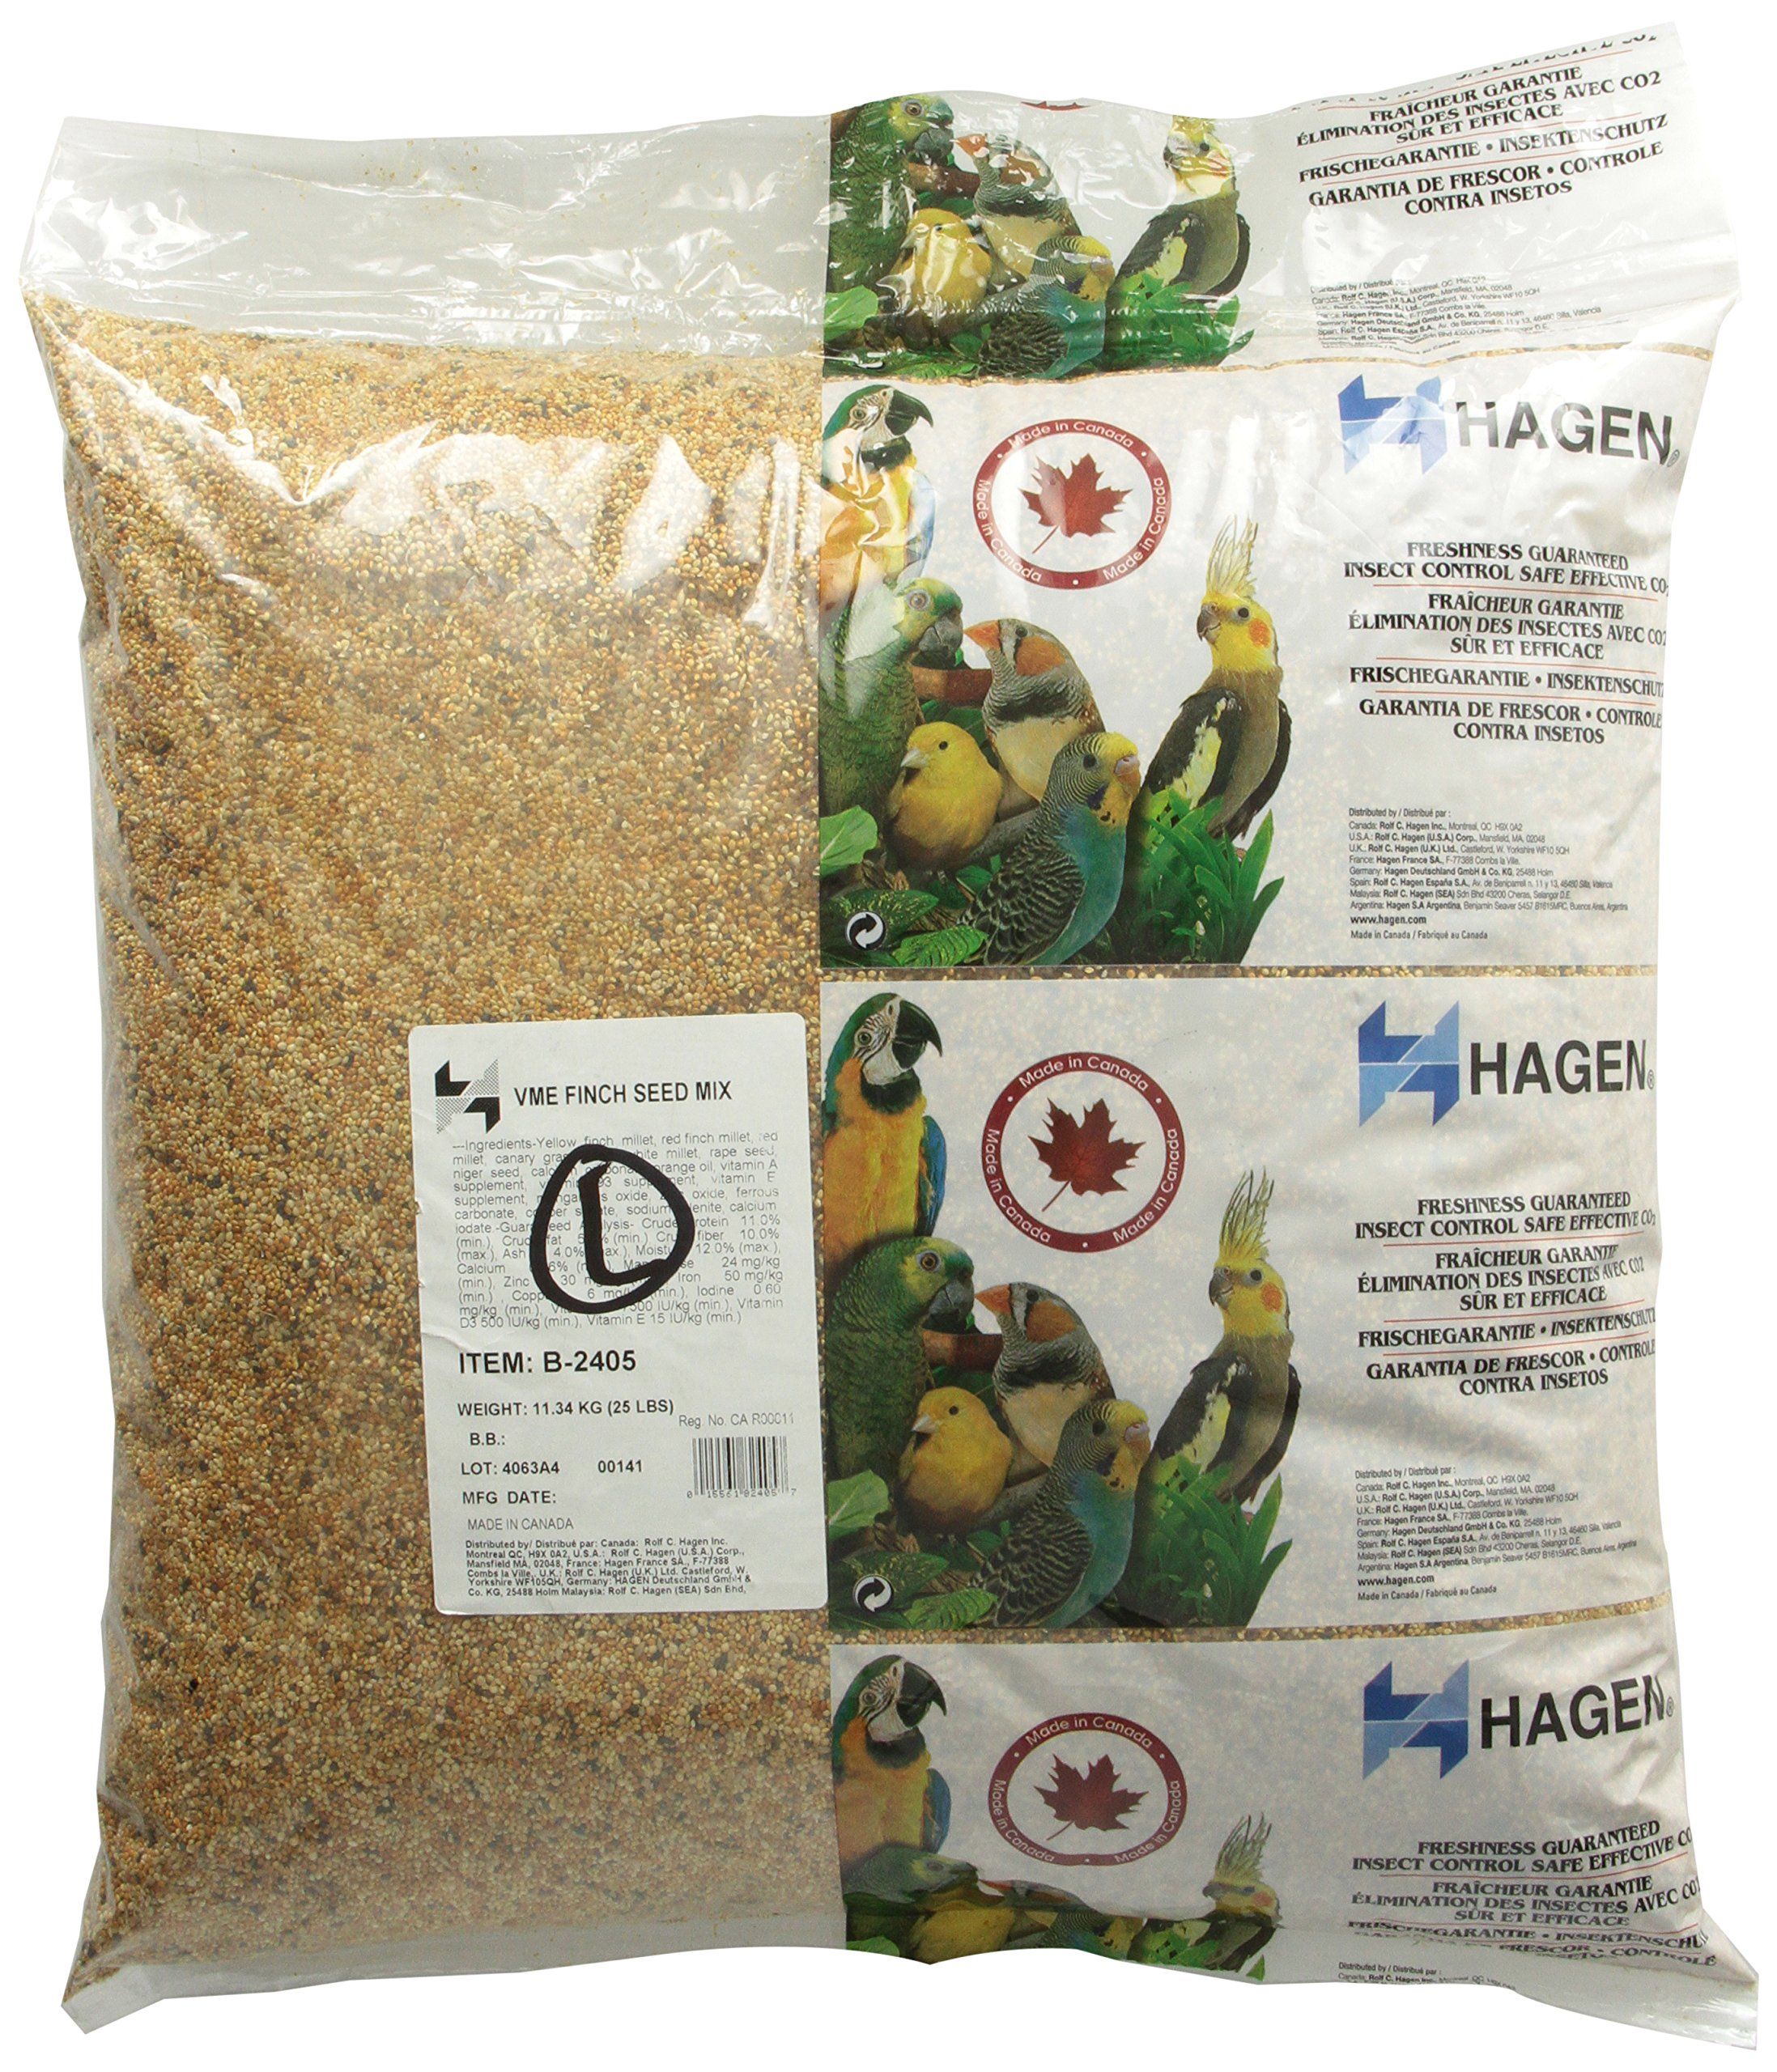 Finch Staple Vme Seed, 25-Pound by Hagen